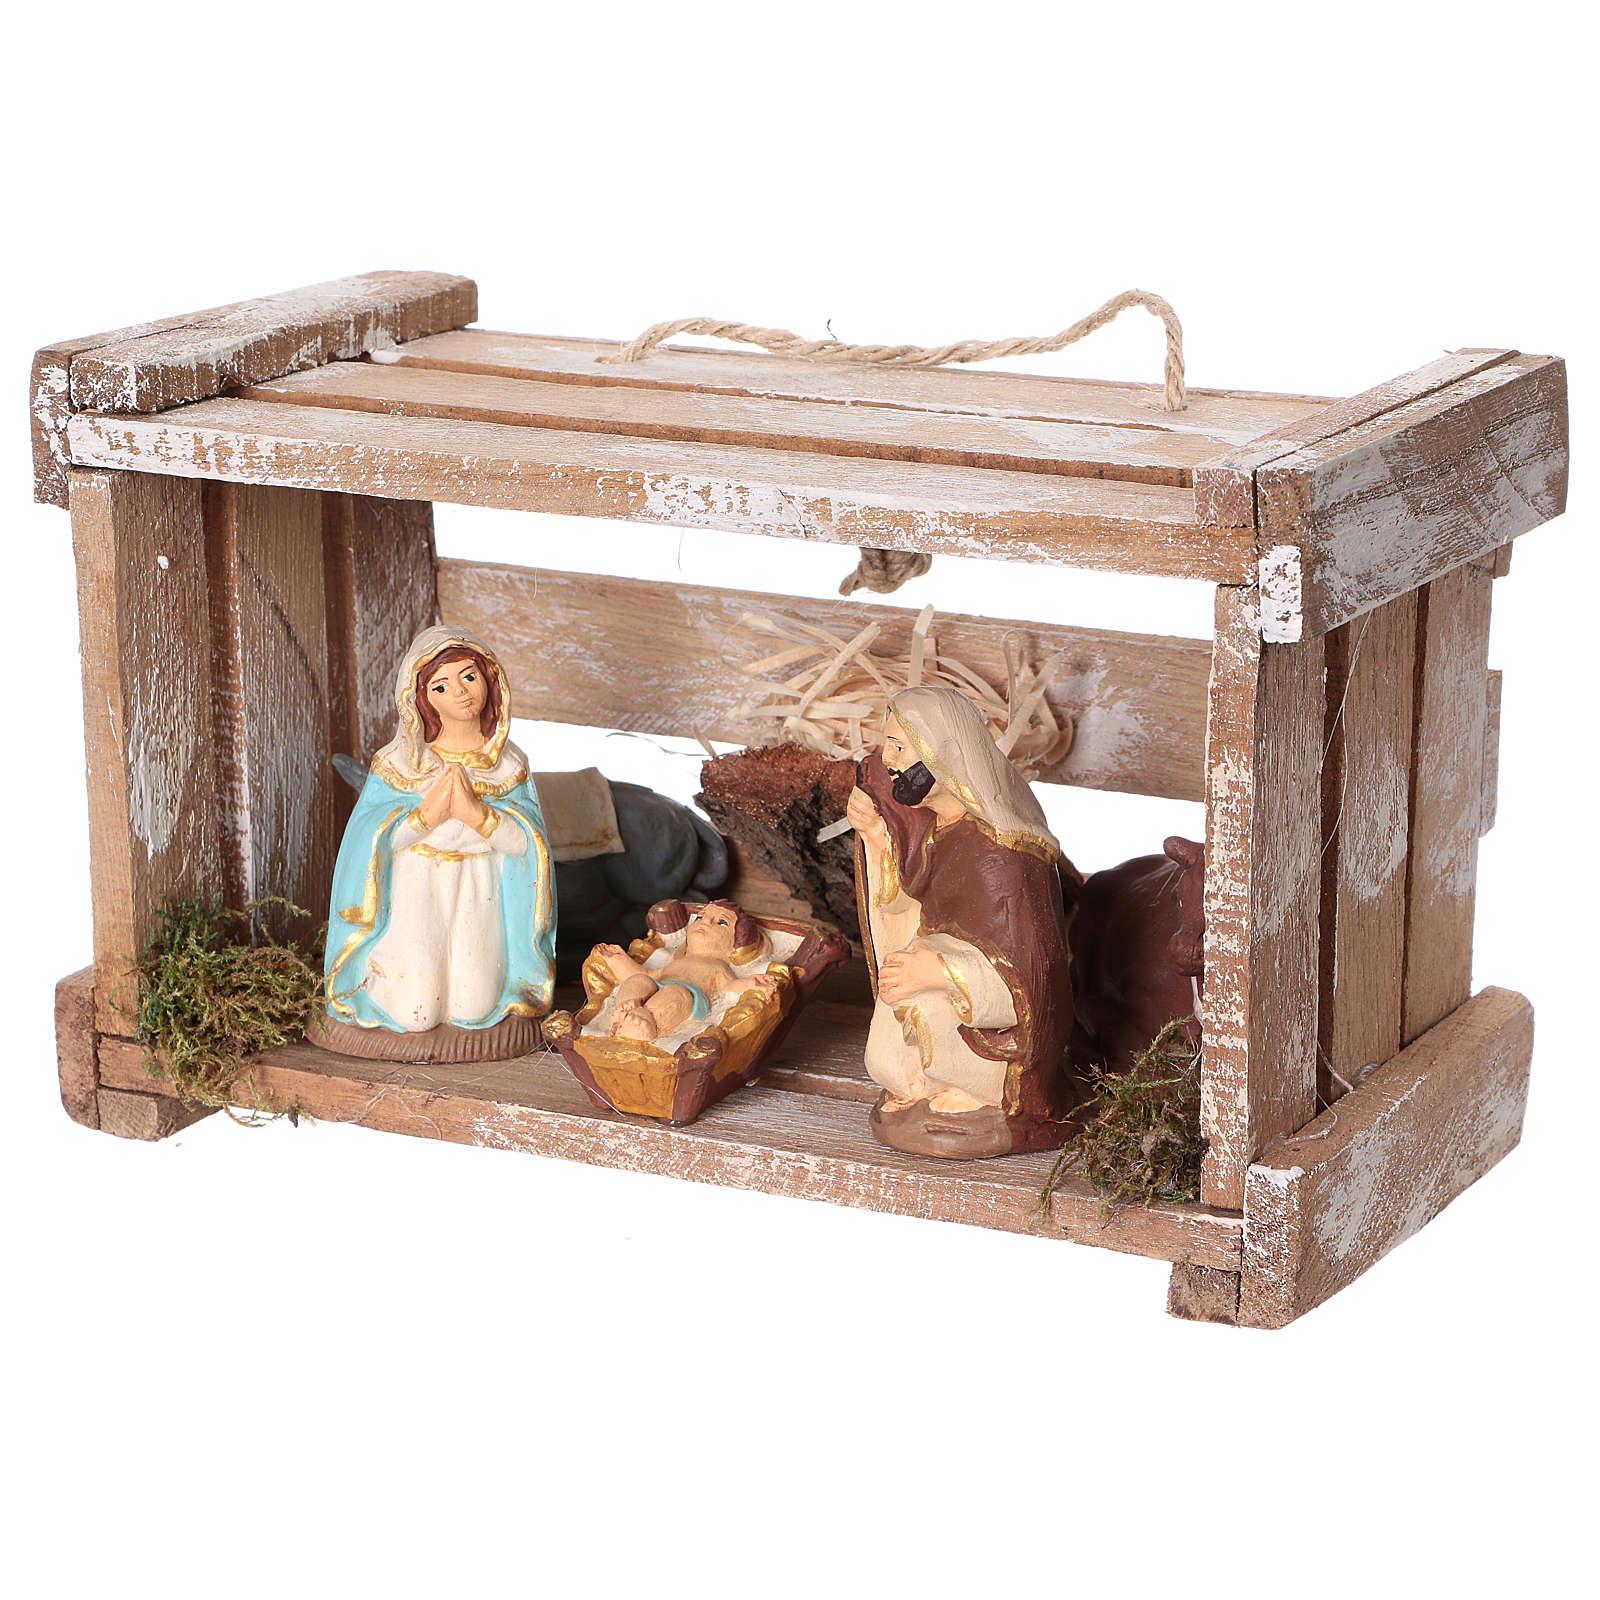 Portable wood box with Deruta Nativity scene 8 cm (Umbria) 4